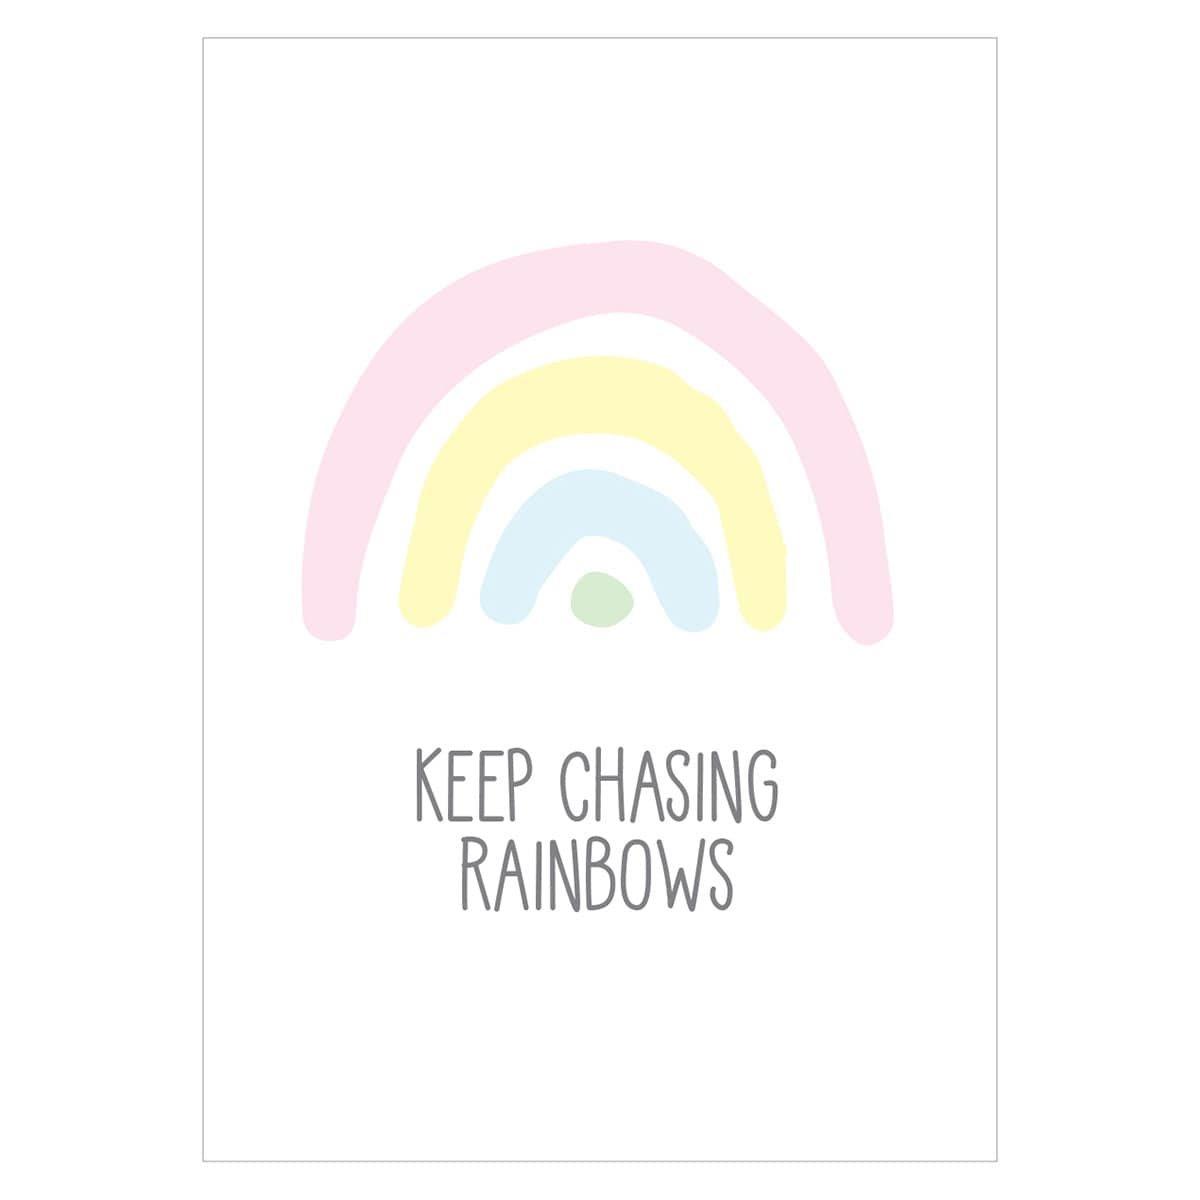 e56a8cdb8 'Keep Chasing Rainbows' Pastel Nursery Print